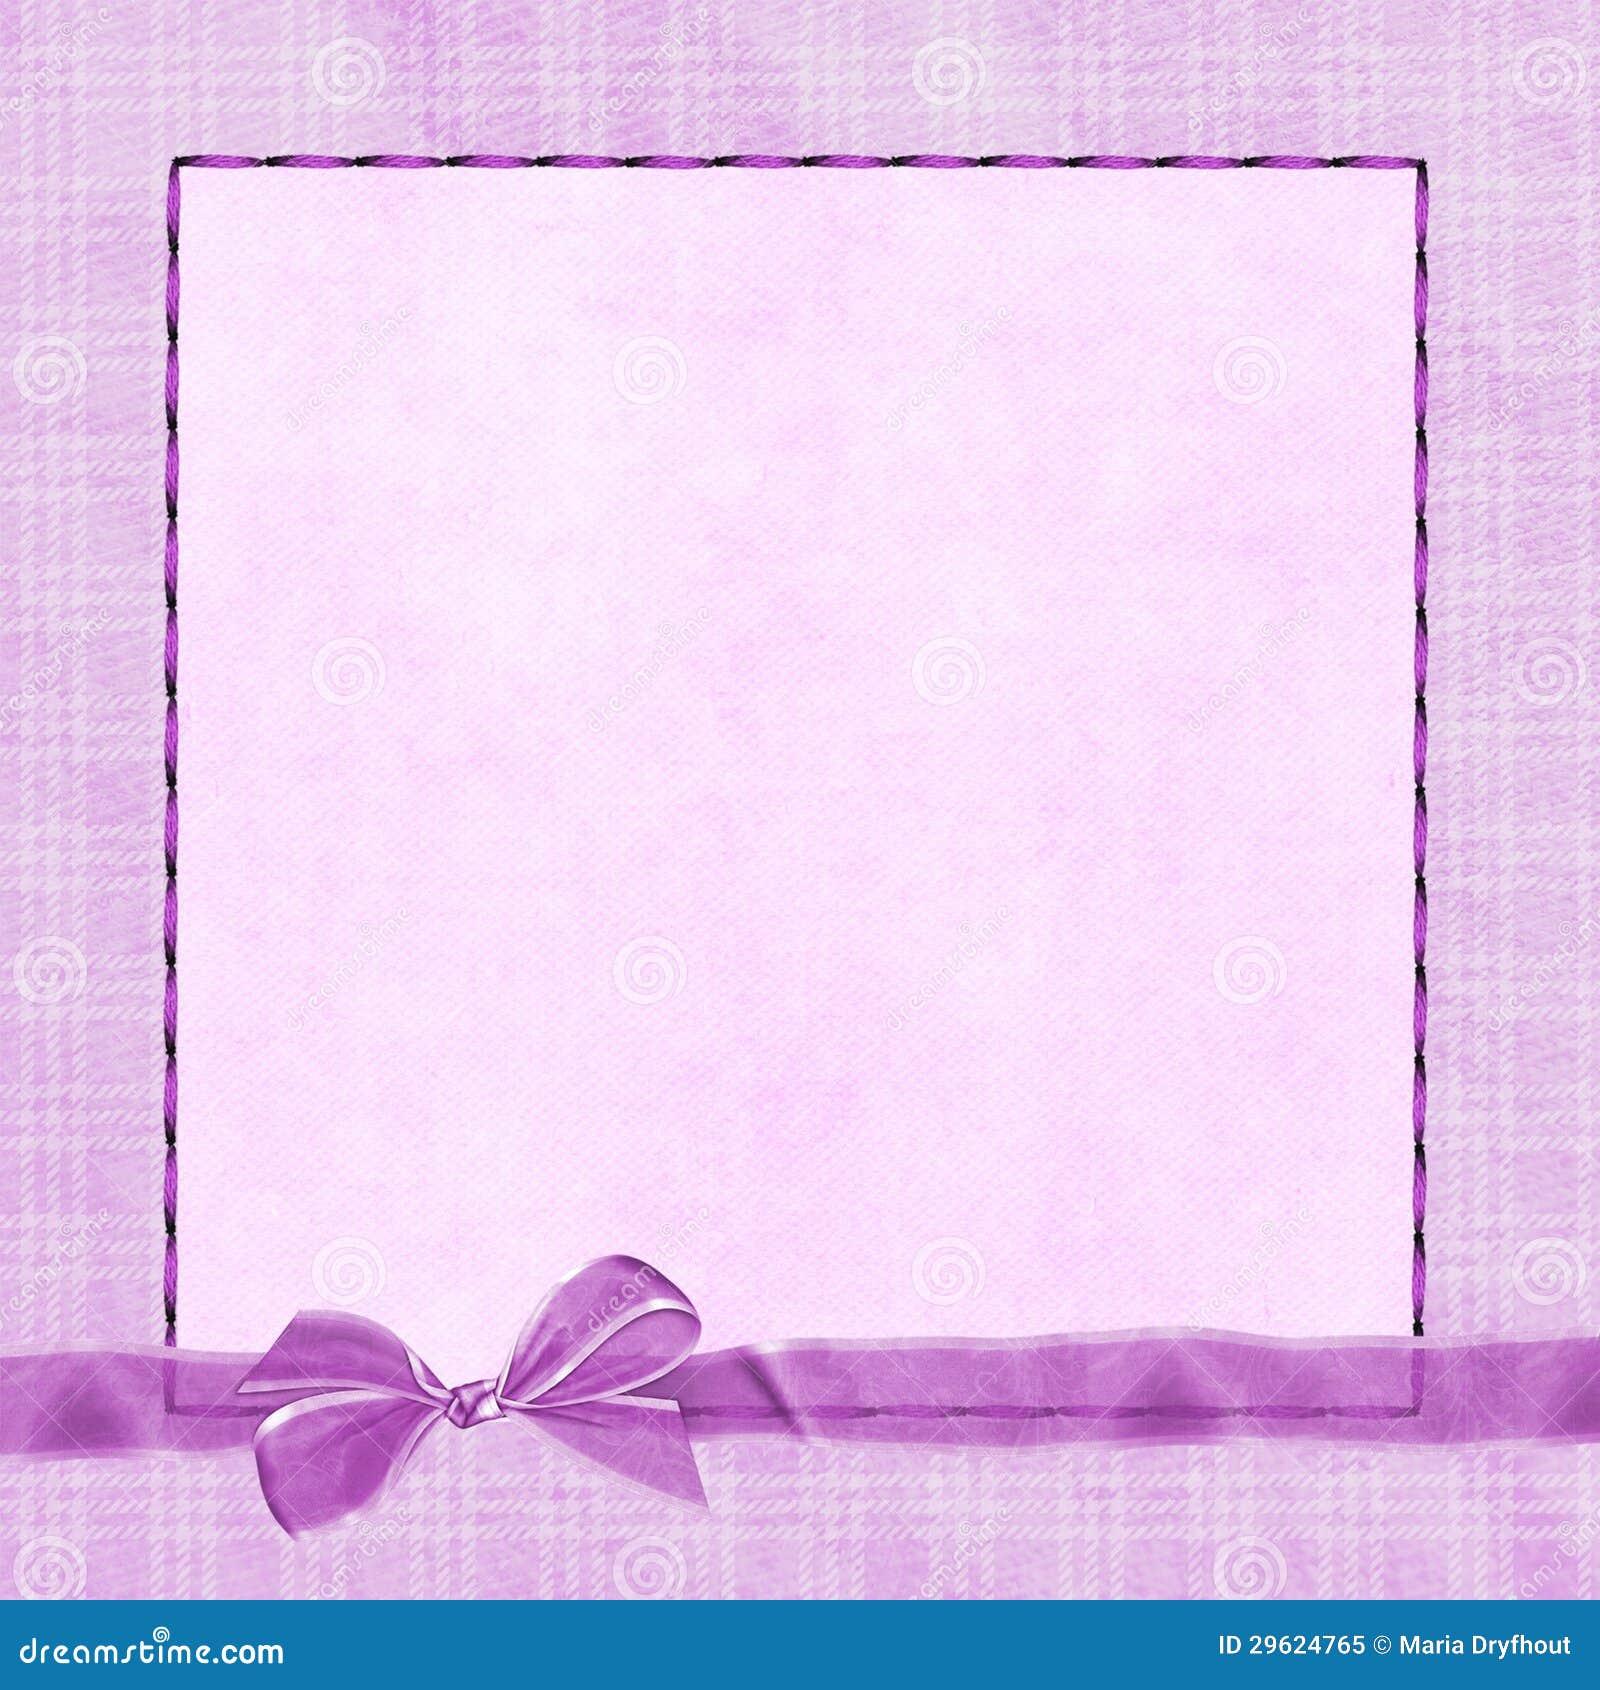 Pink Bow On Plaid Border Royalty Free Stock Photo - Image ...